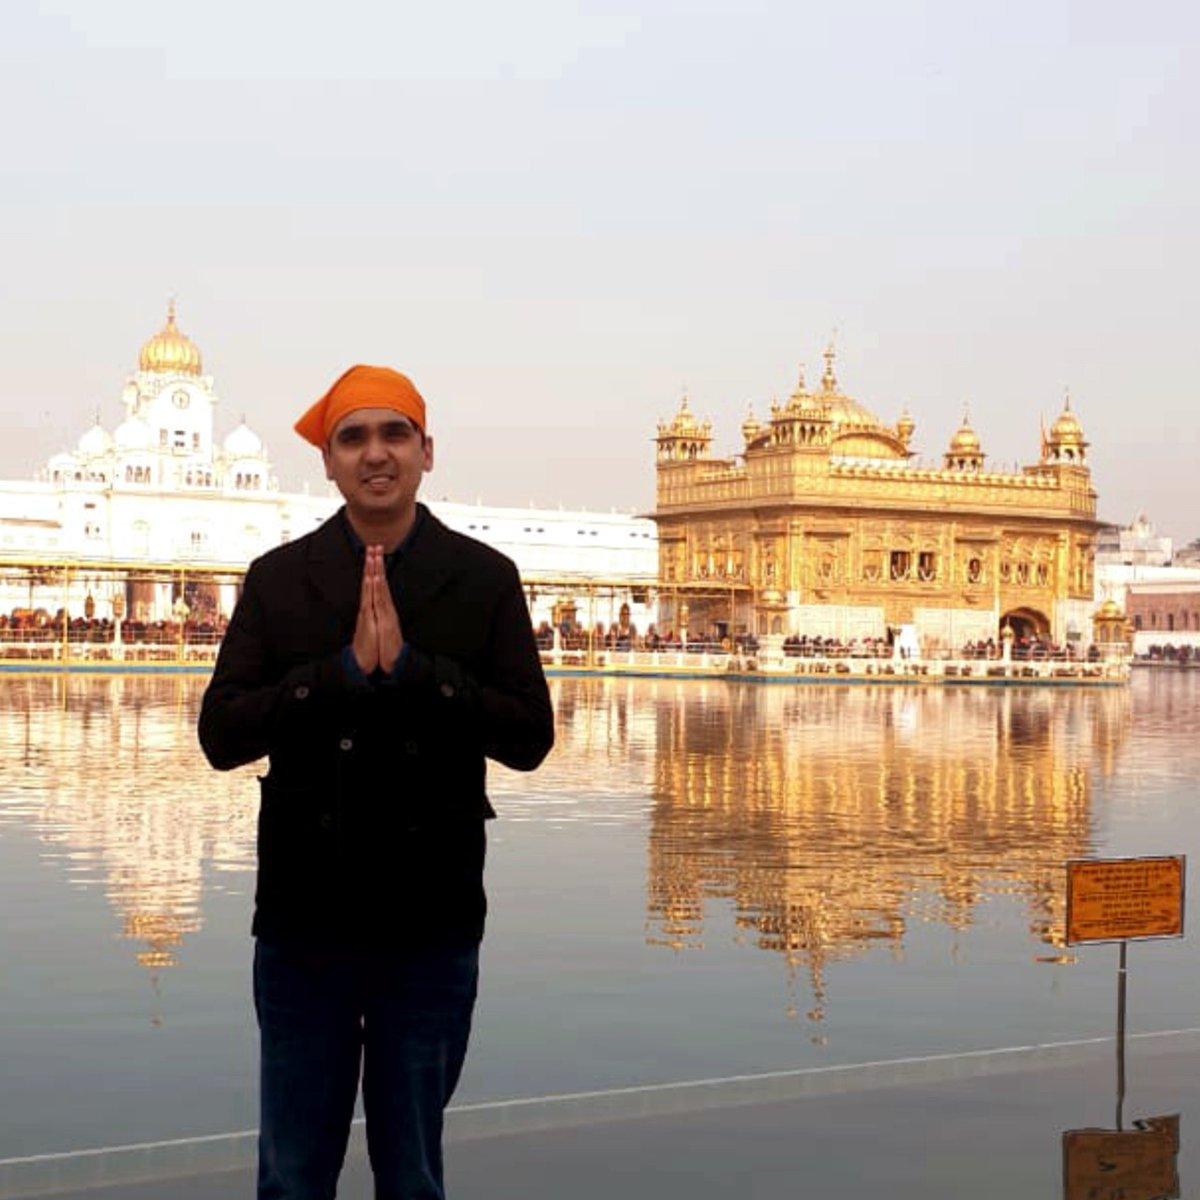 Seeking the blessings of the Almighty at Golden Temple, Amritsar. #goldentemple #goldentempleamritsar #harmandirsahib #goldentemple#waheguruji#networkmarketing #motivationalspeaker #friday #FridayMotivation  #entrepreneurlife #entrepreneurship #motivationfriday #princesainipic.twitter.com/DYHoVbT9FP